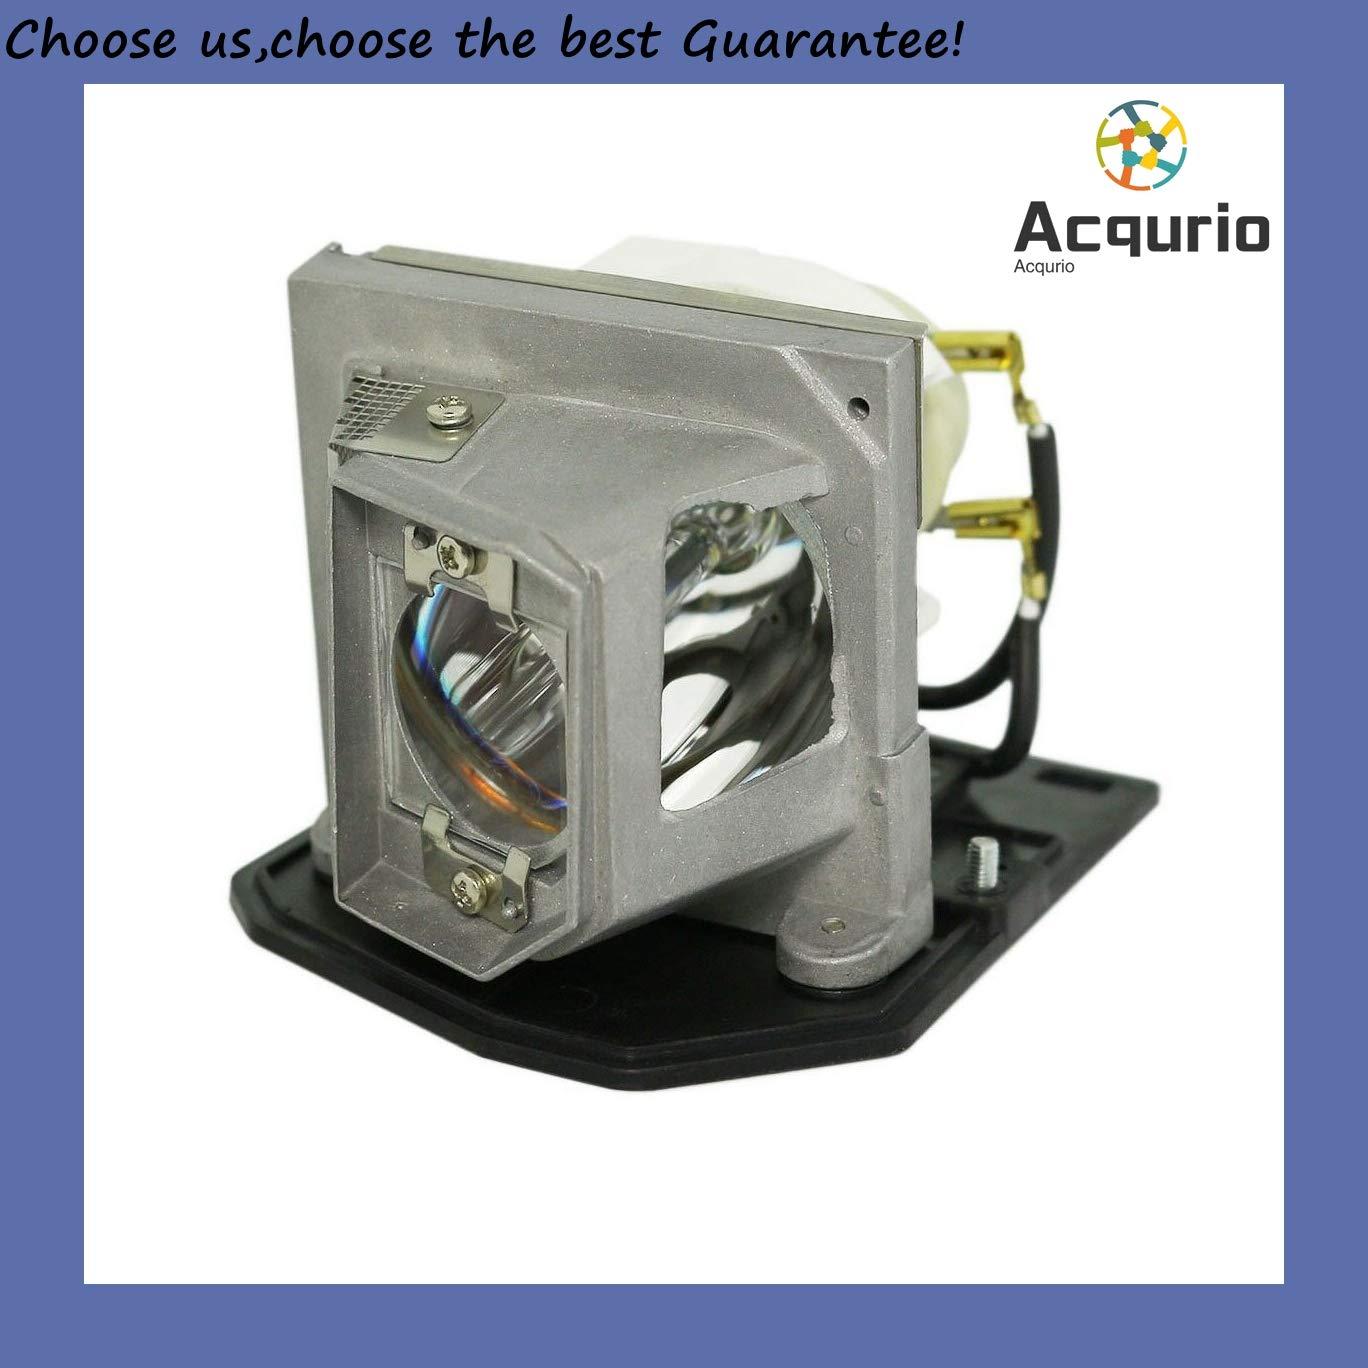 MC.JGL11.001 - Lámpara Original con Carcasa para Acer P1163/X1263 ...